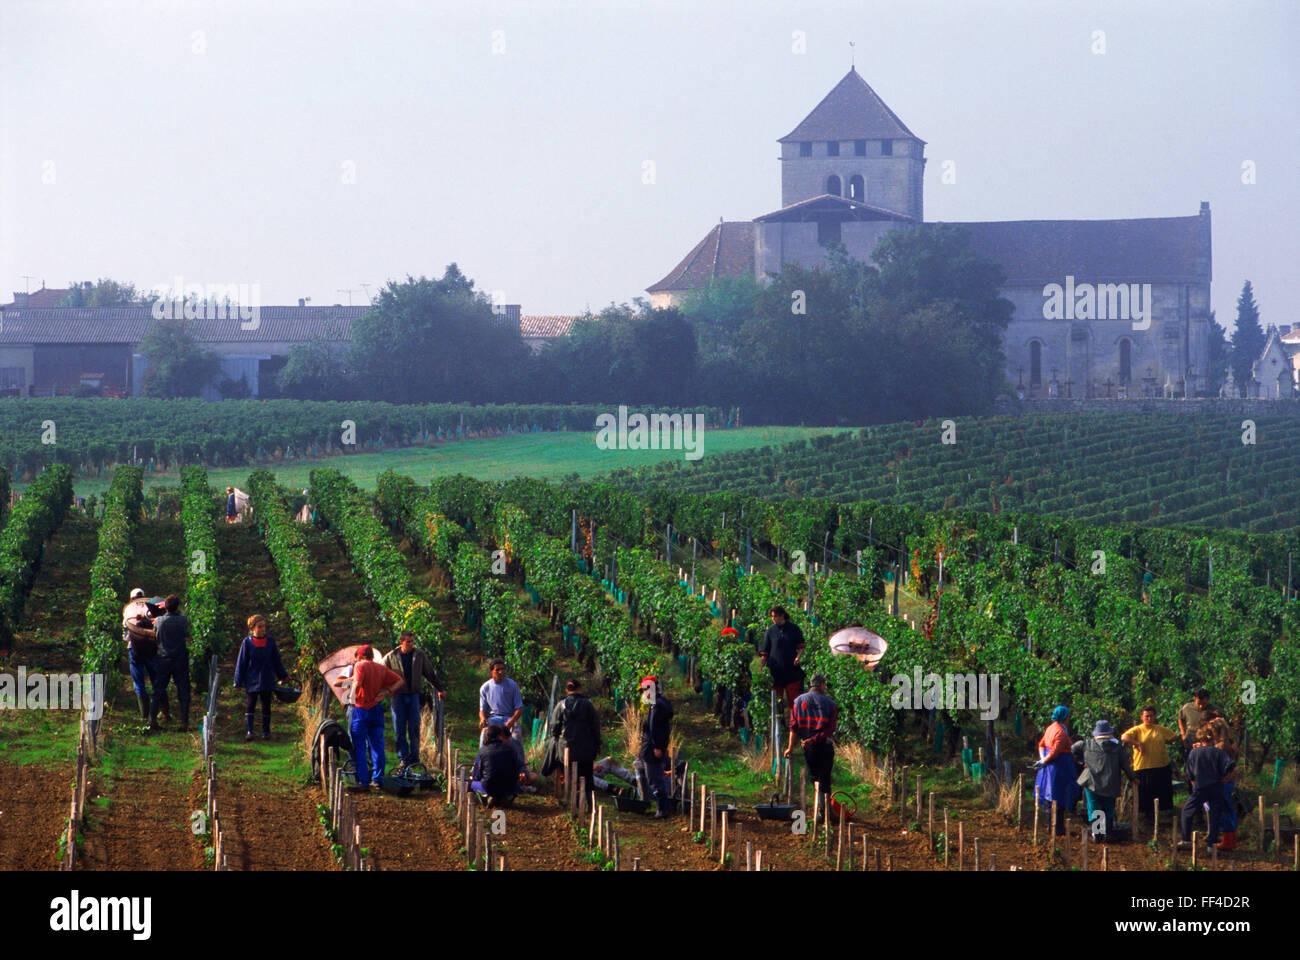 Harvesting grapes in Bordeaux vineyards near St Emilion France - Stock Image